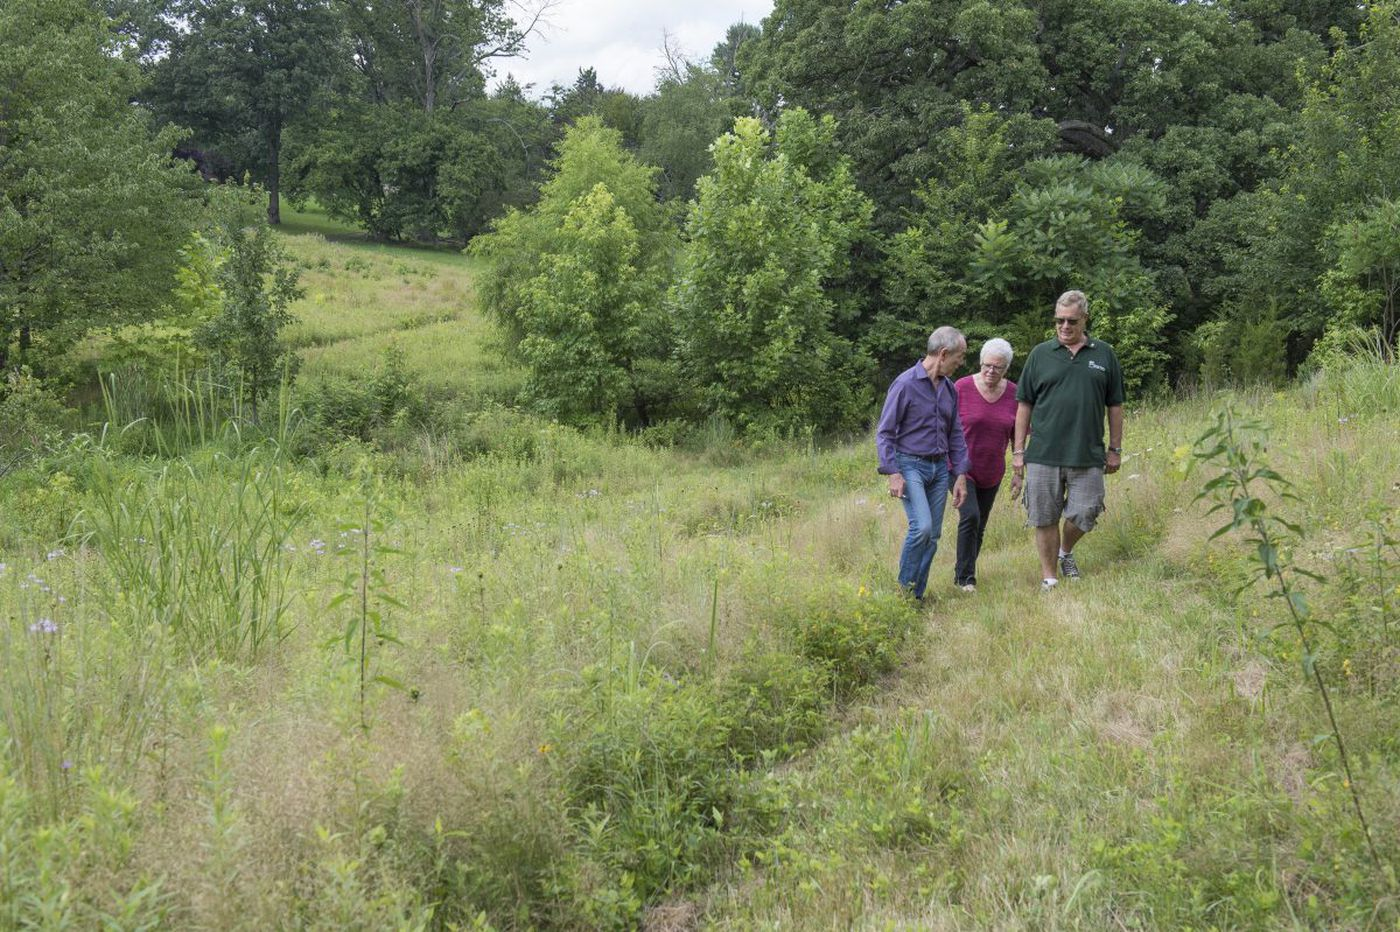 A happy 115th birthday to Trenton's Cadwalader Park